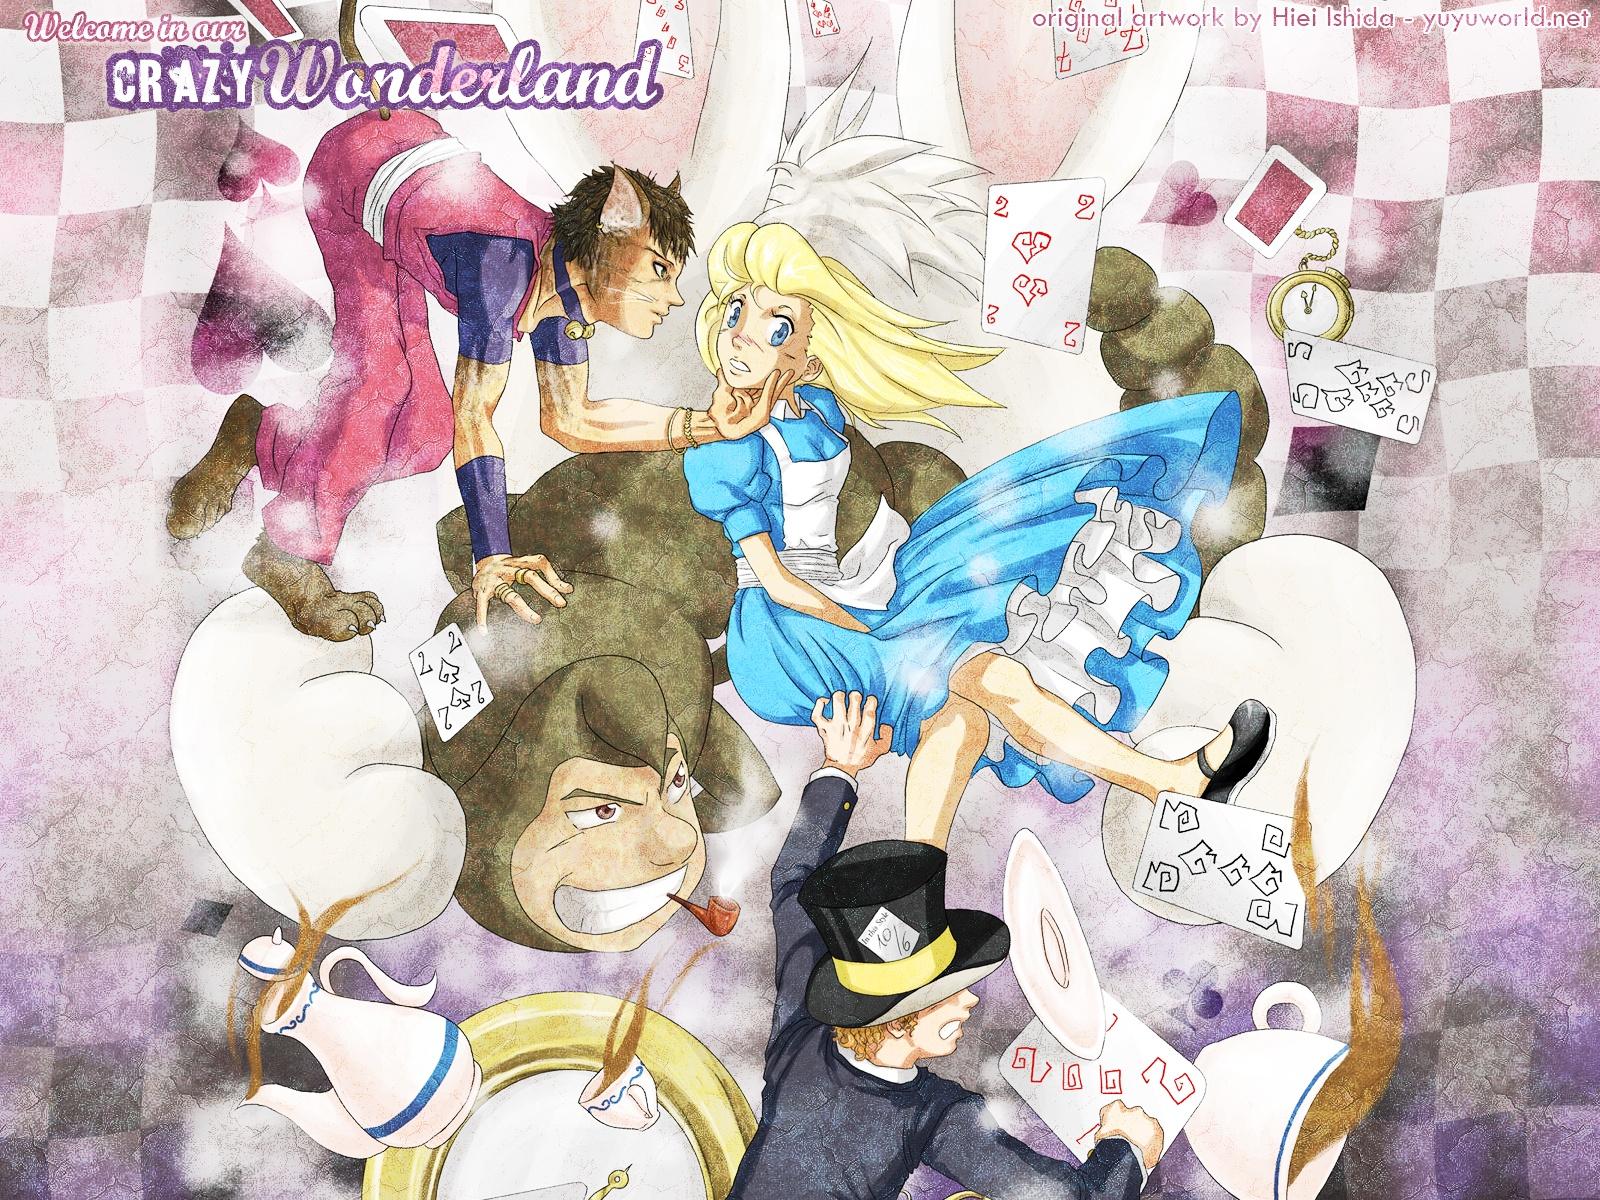 alice_in_wonderland alice_(wonderland) animal_ears blonde_hair catboy cheshire_cat dress drink hat hiei_ishida mad_hatter signed tail